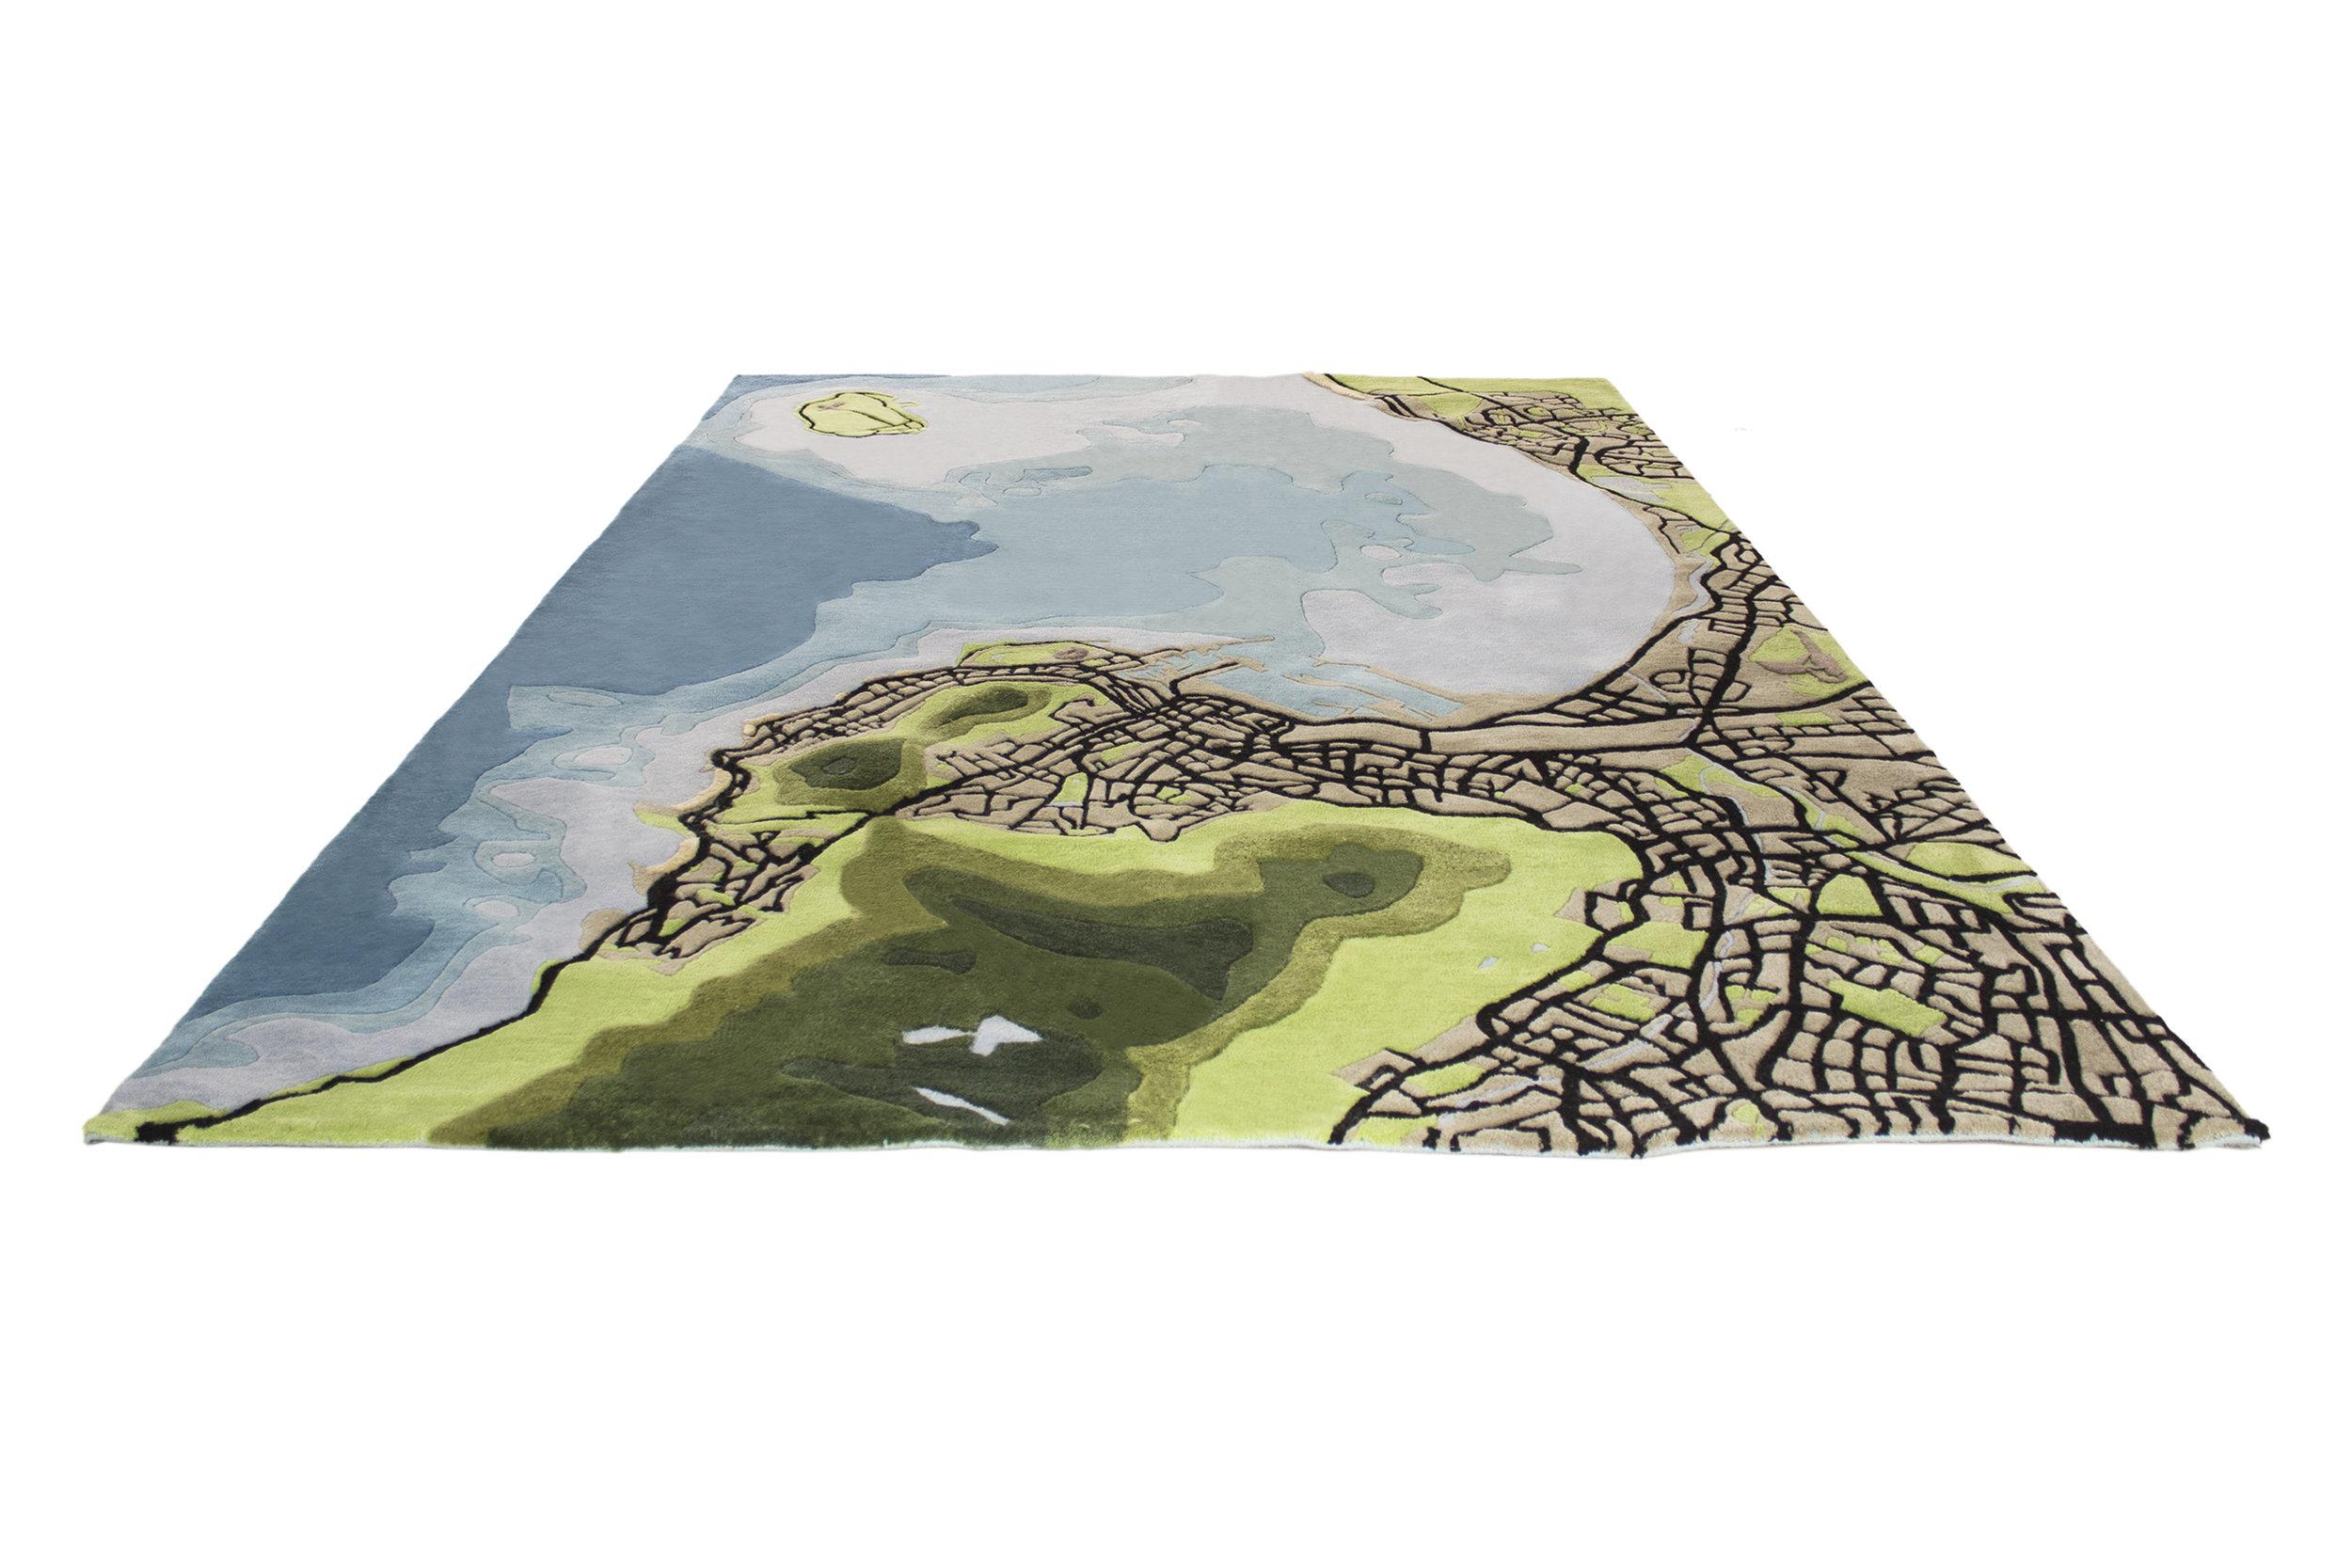 cape-town-carpet-shift-perspective-3.jpg